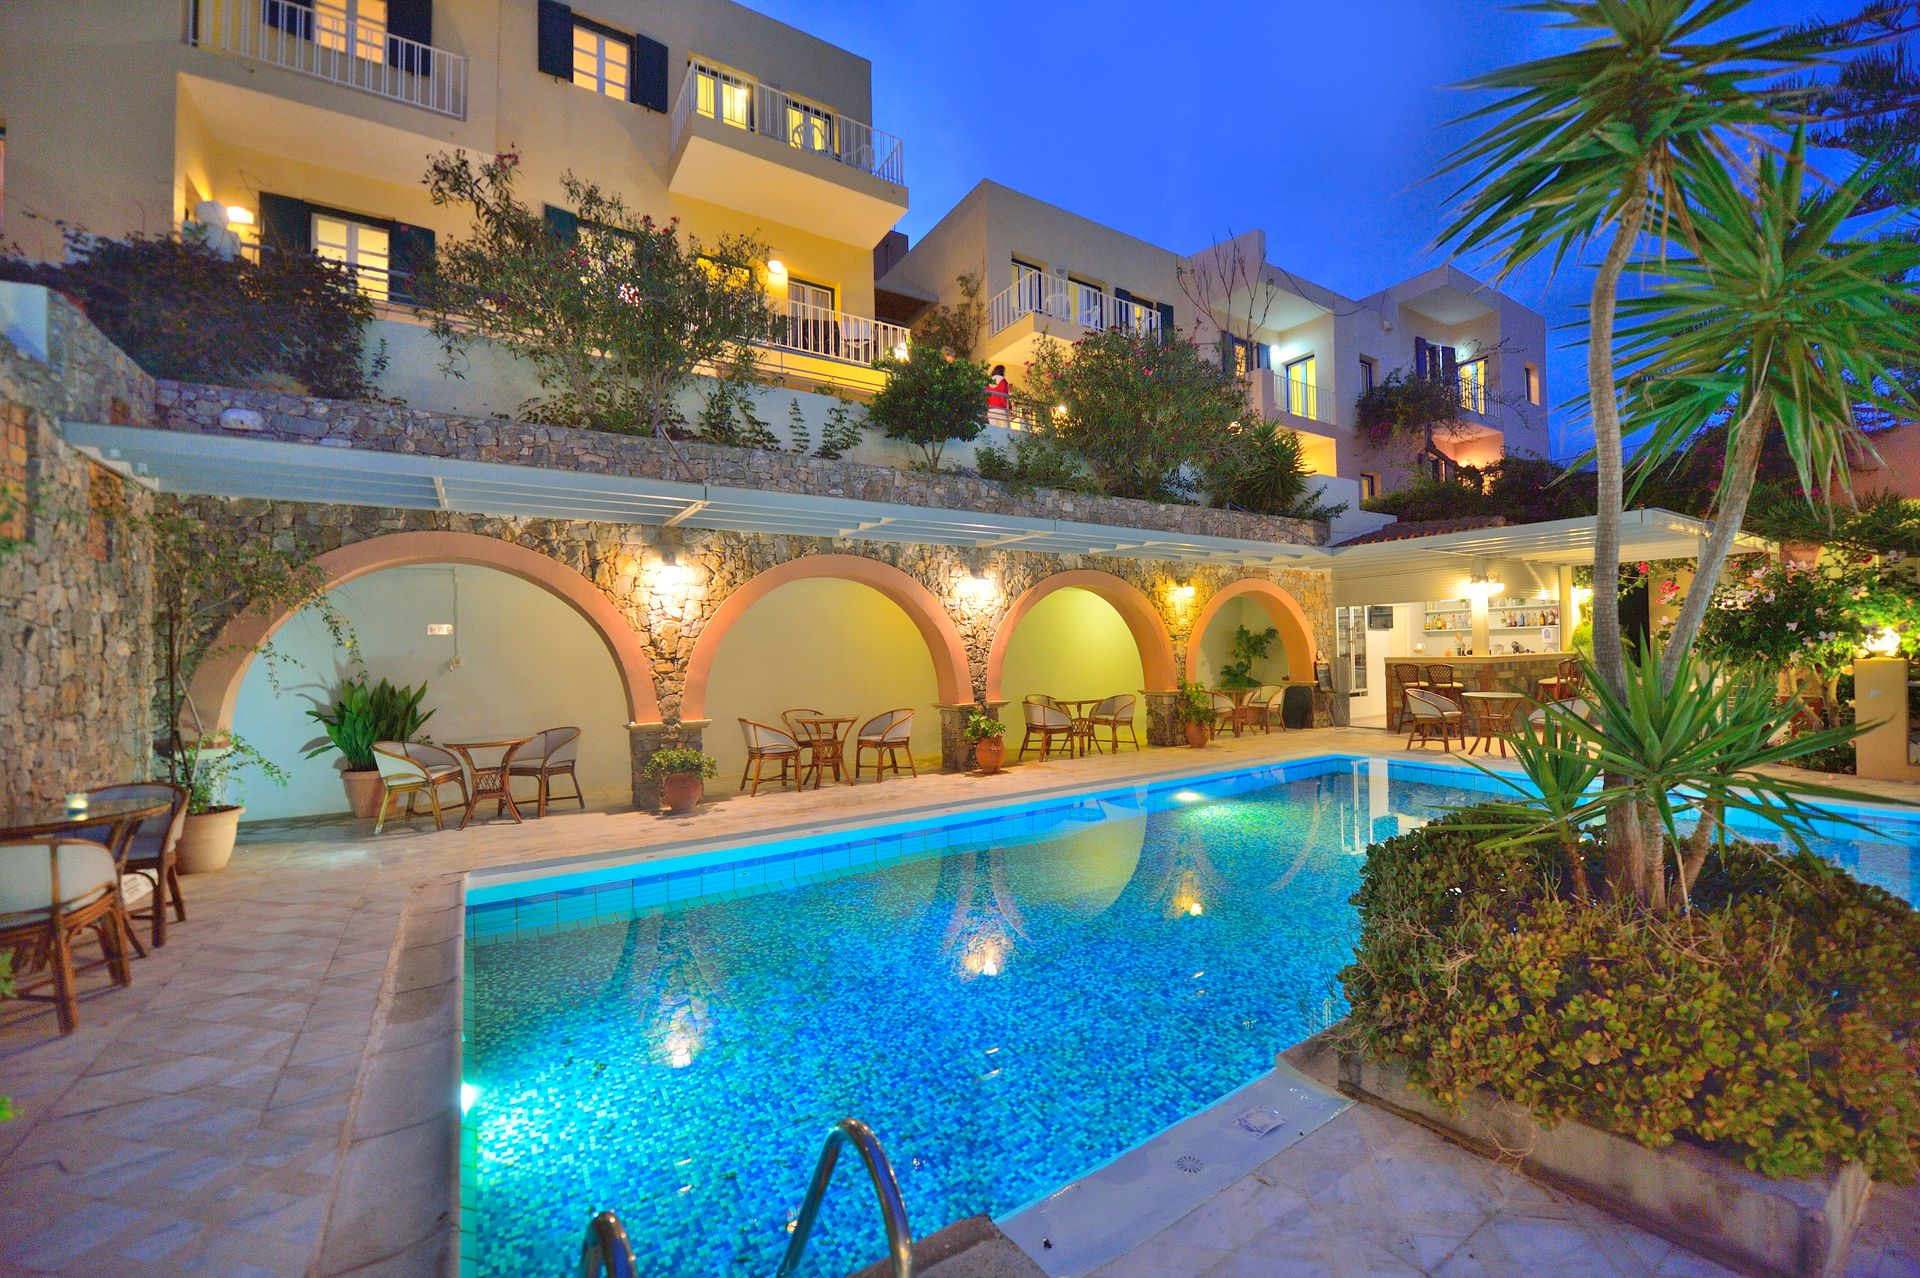 Aphea Village Chania - Κρήτη ✦ 2 Ημέρες (1 Διανυκτέρευση)